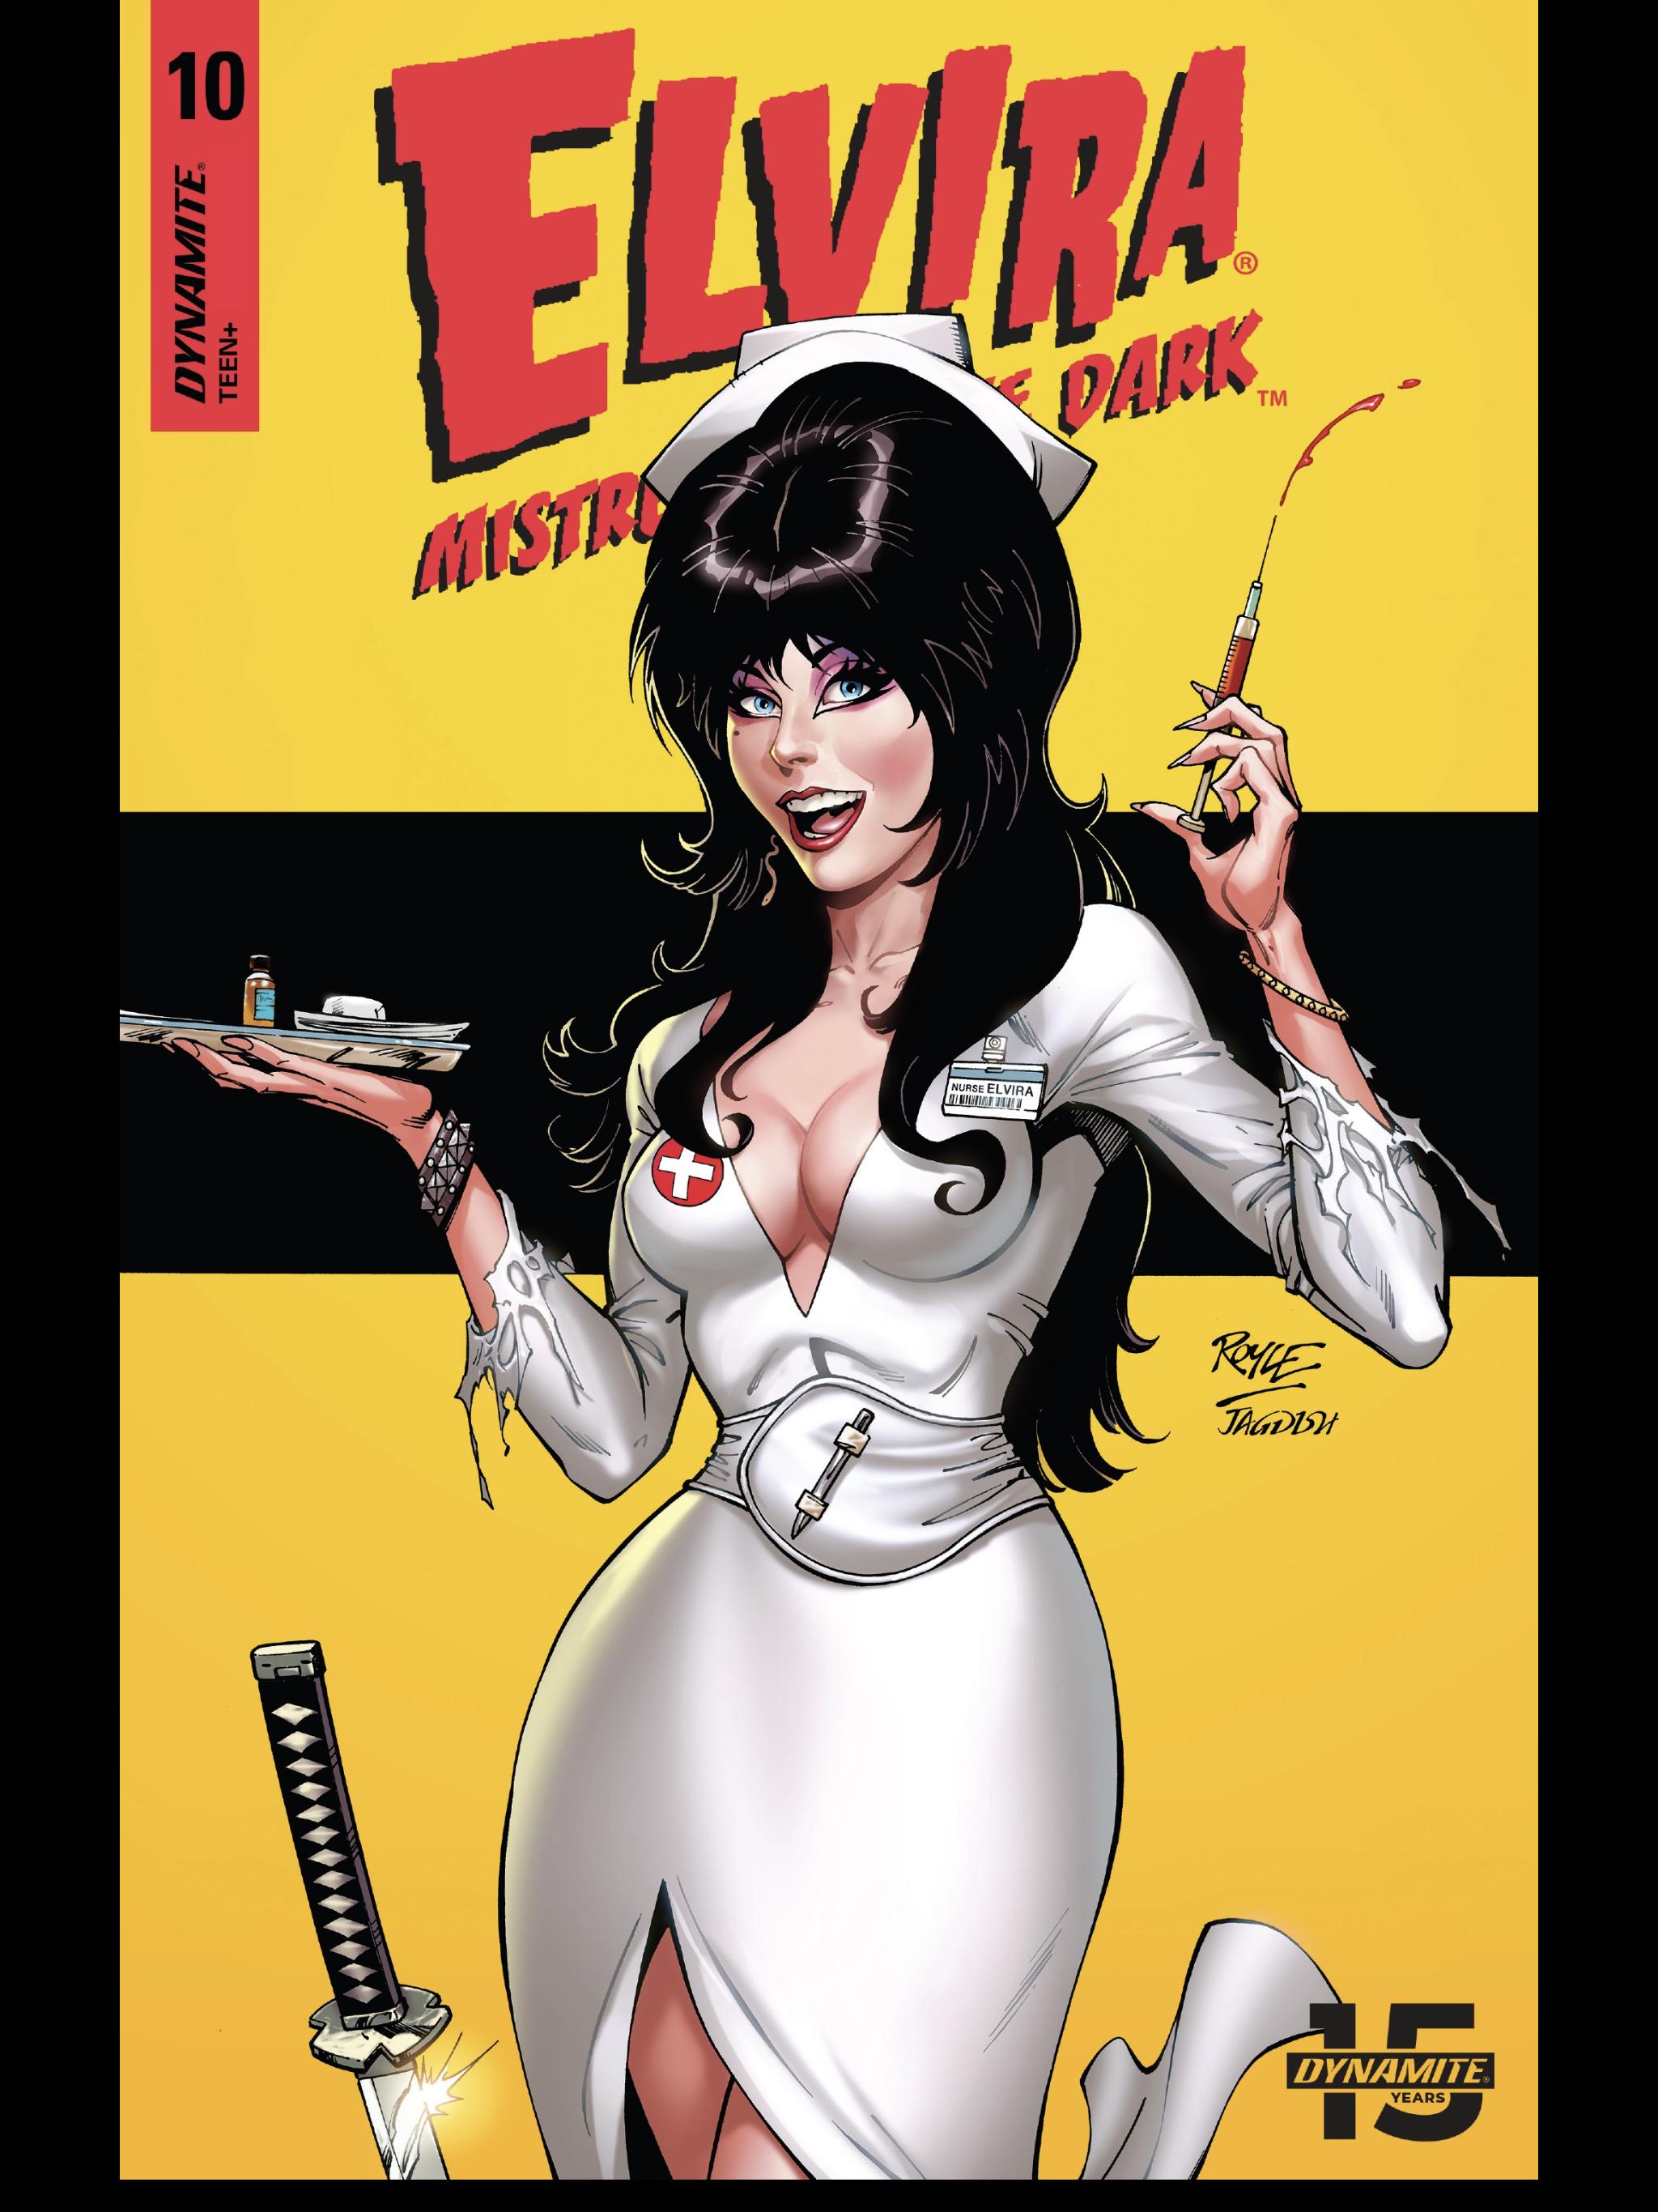 Pin by Shawn3 on Elvira / Cassandra Peterson Comic book